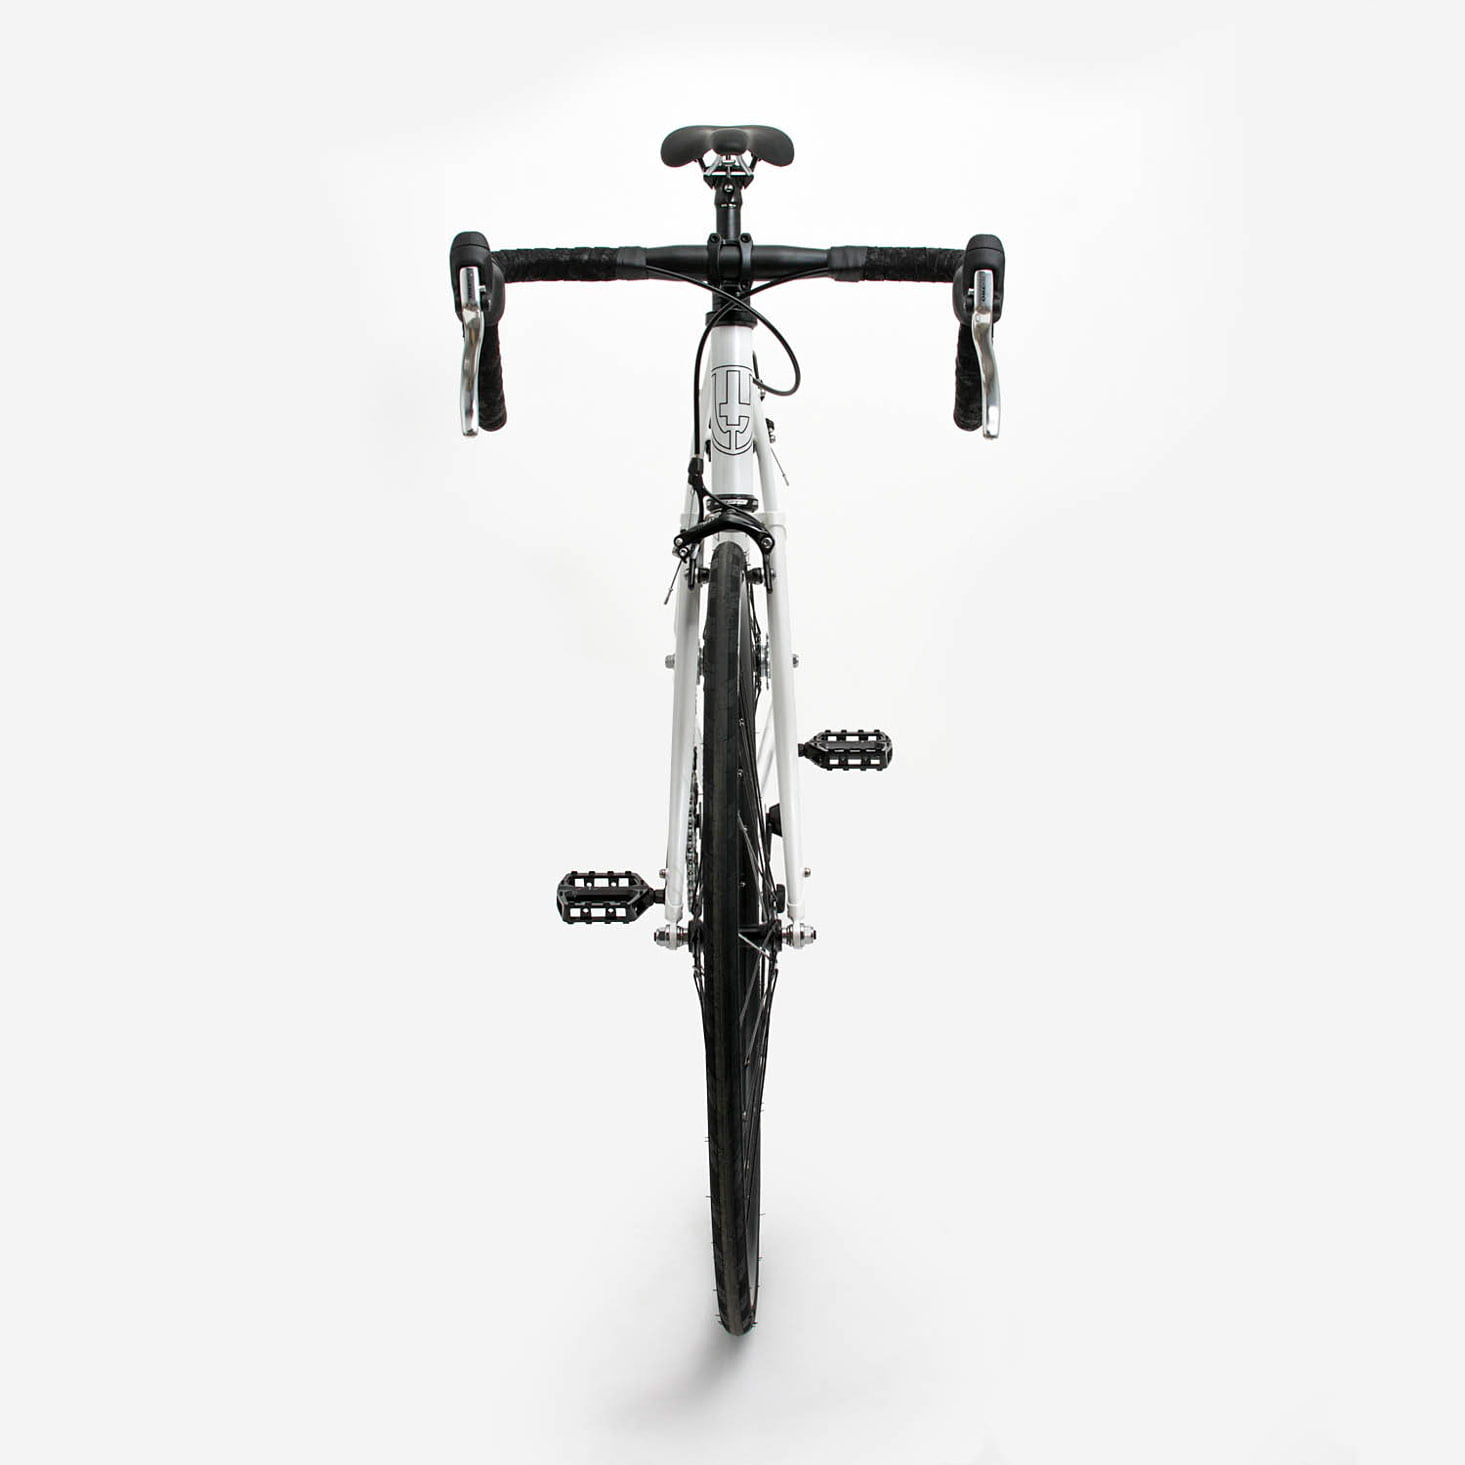 Landyachtz_Spitfire_White_Single_Speed_Bikes_8_DSC4841